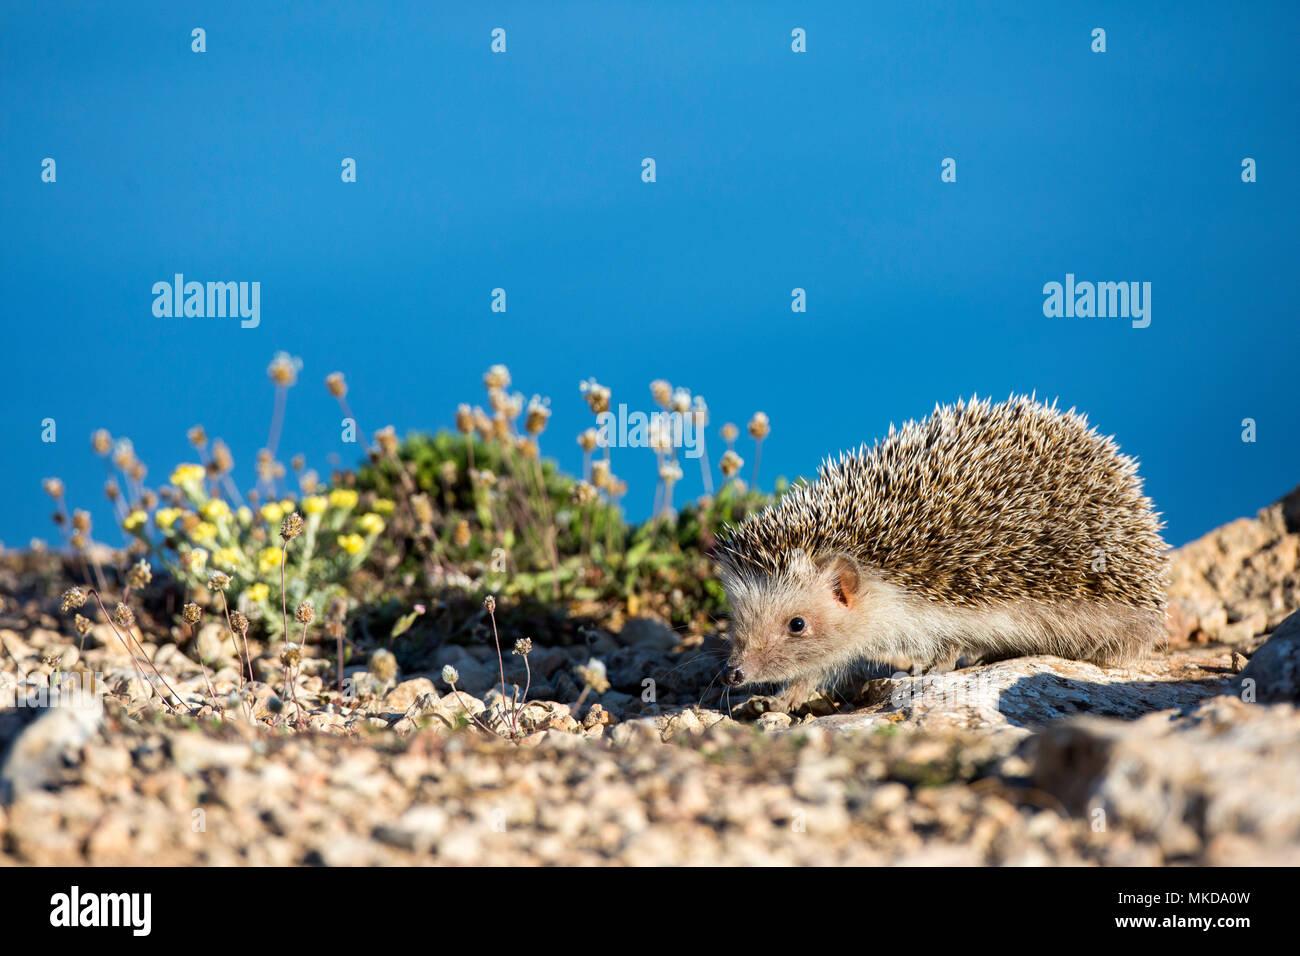 African Hedgehog (Atelerix algirus), Ibiza, Spain - Stock Image